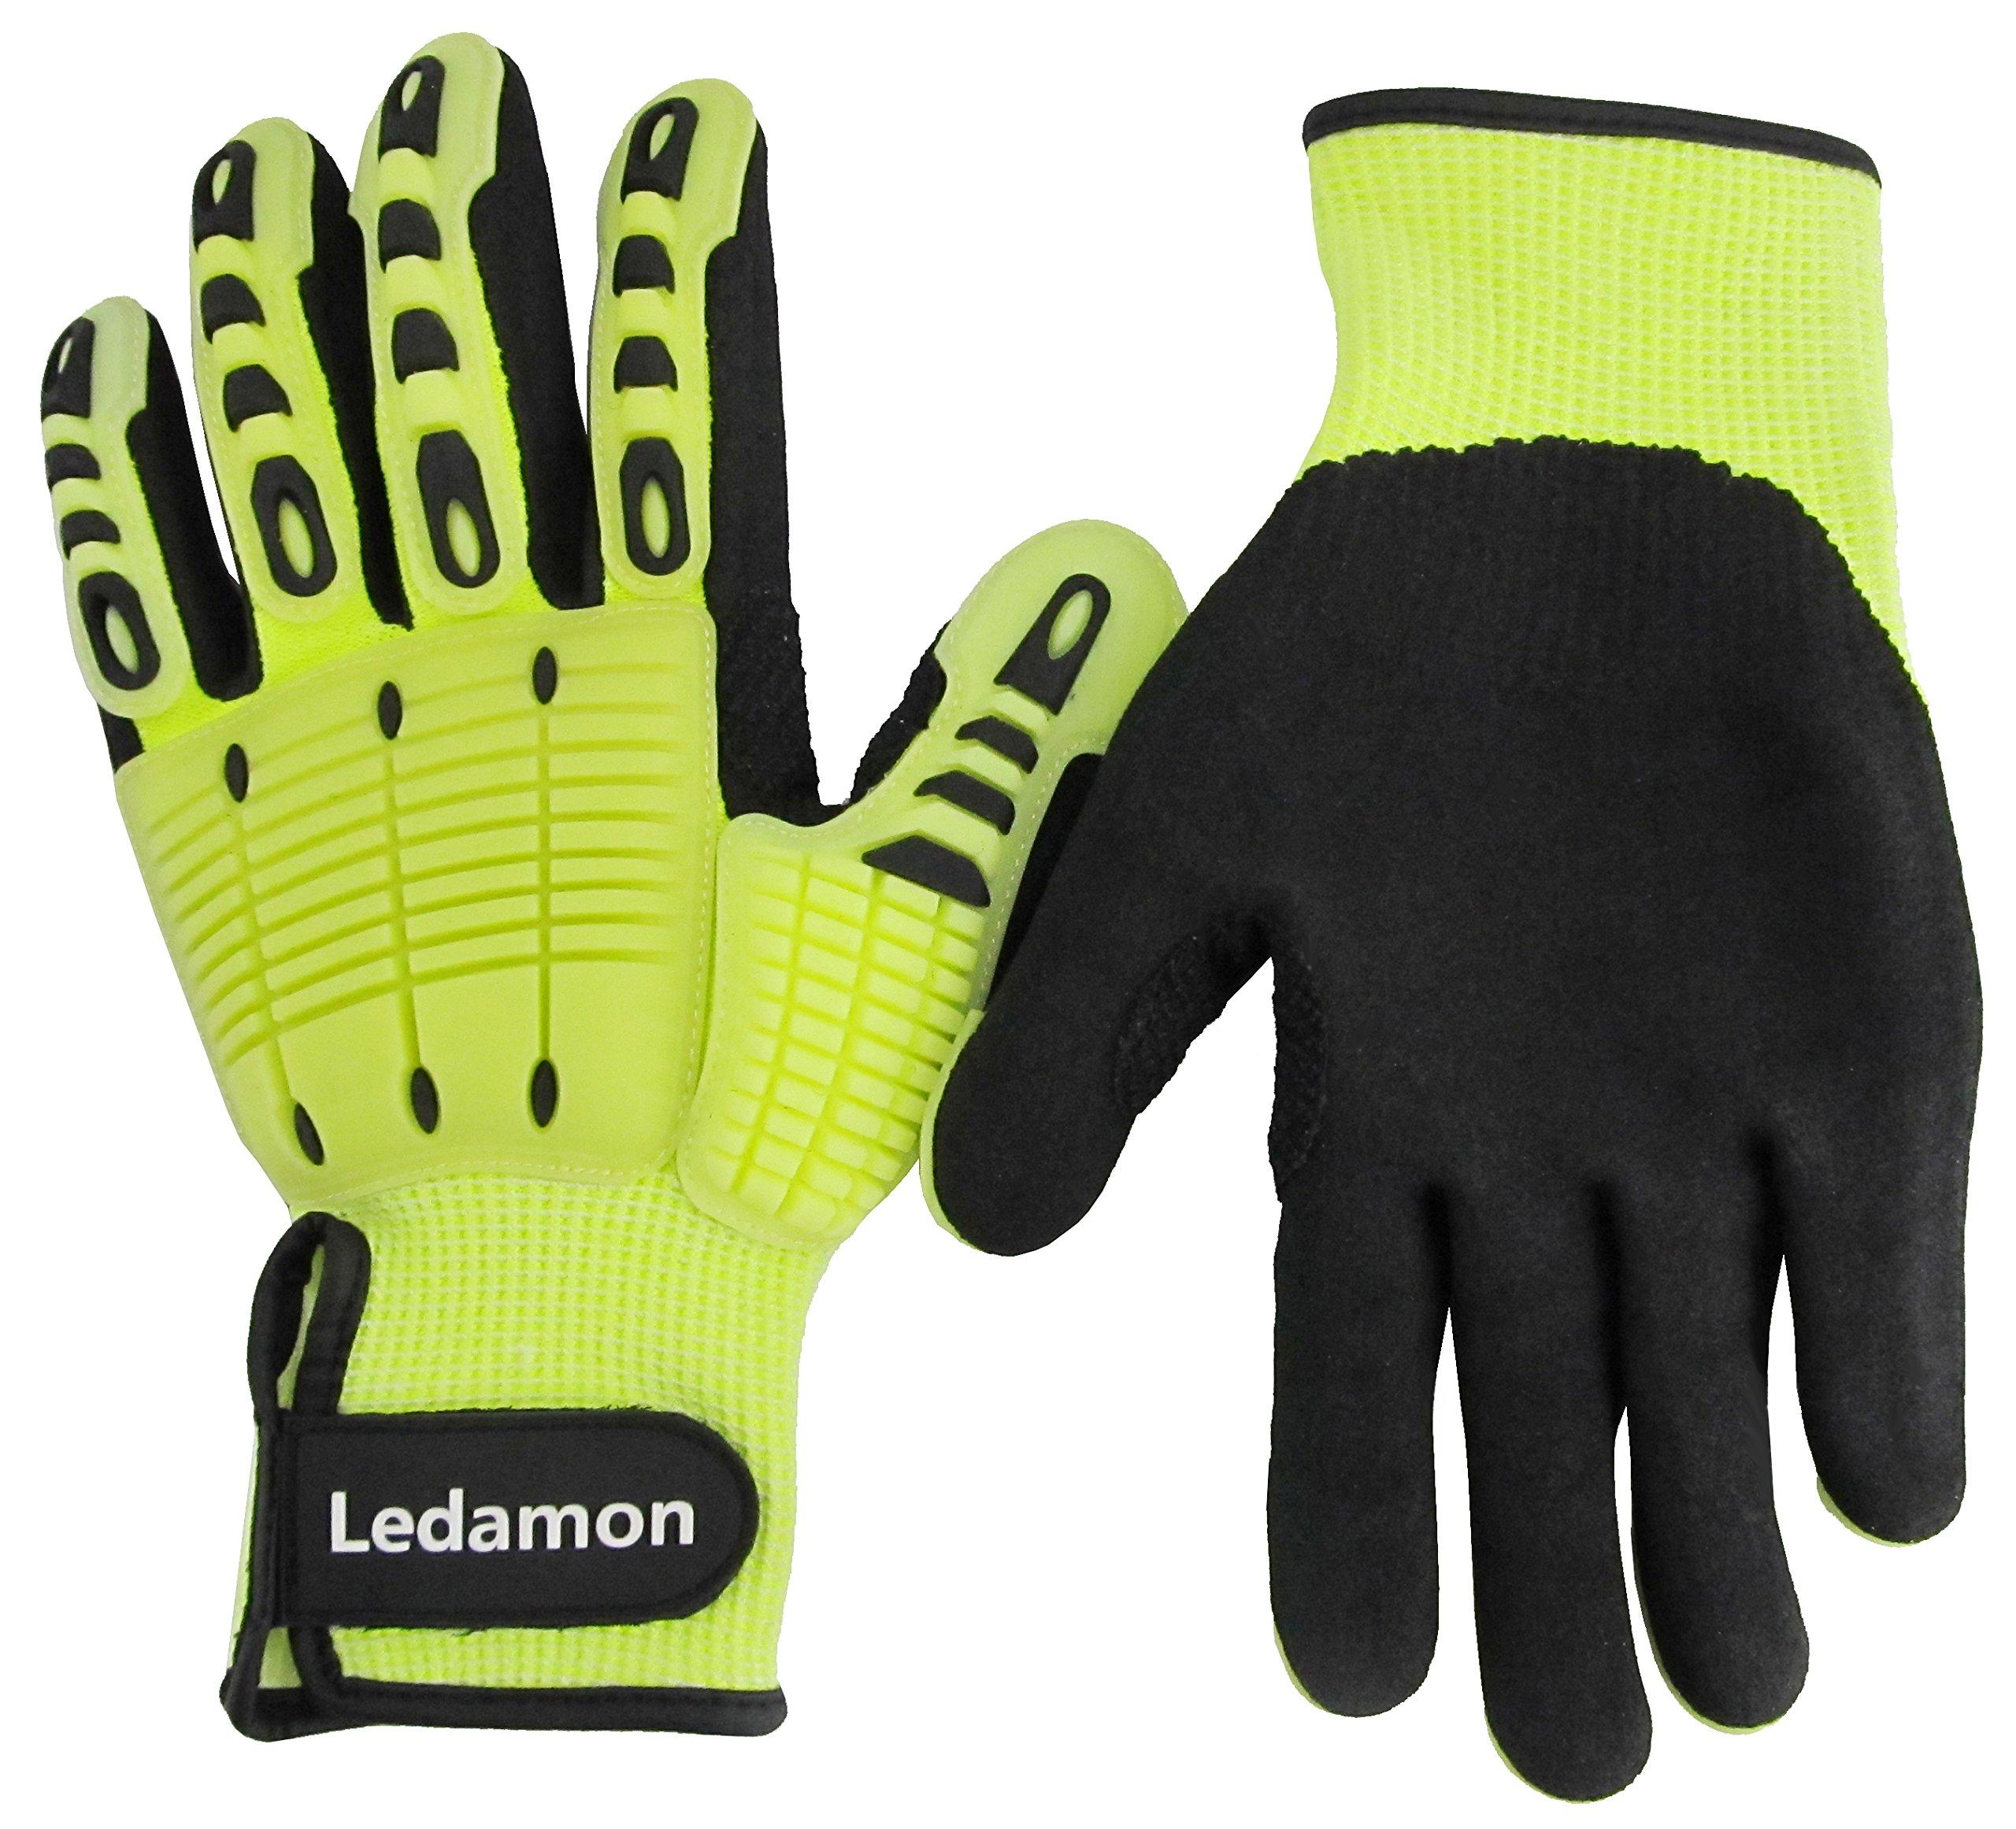 Ledamon Anti-Vibration Impact Resistant Cut Resistant Wear Resistant Mechanic Work Gloves Professional-Grade Protection & Durability (XX-Large) by Ledamon (Image #1)